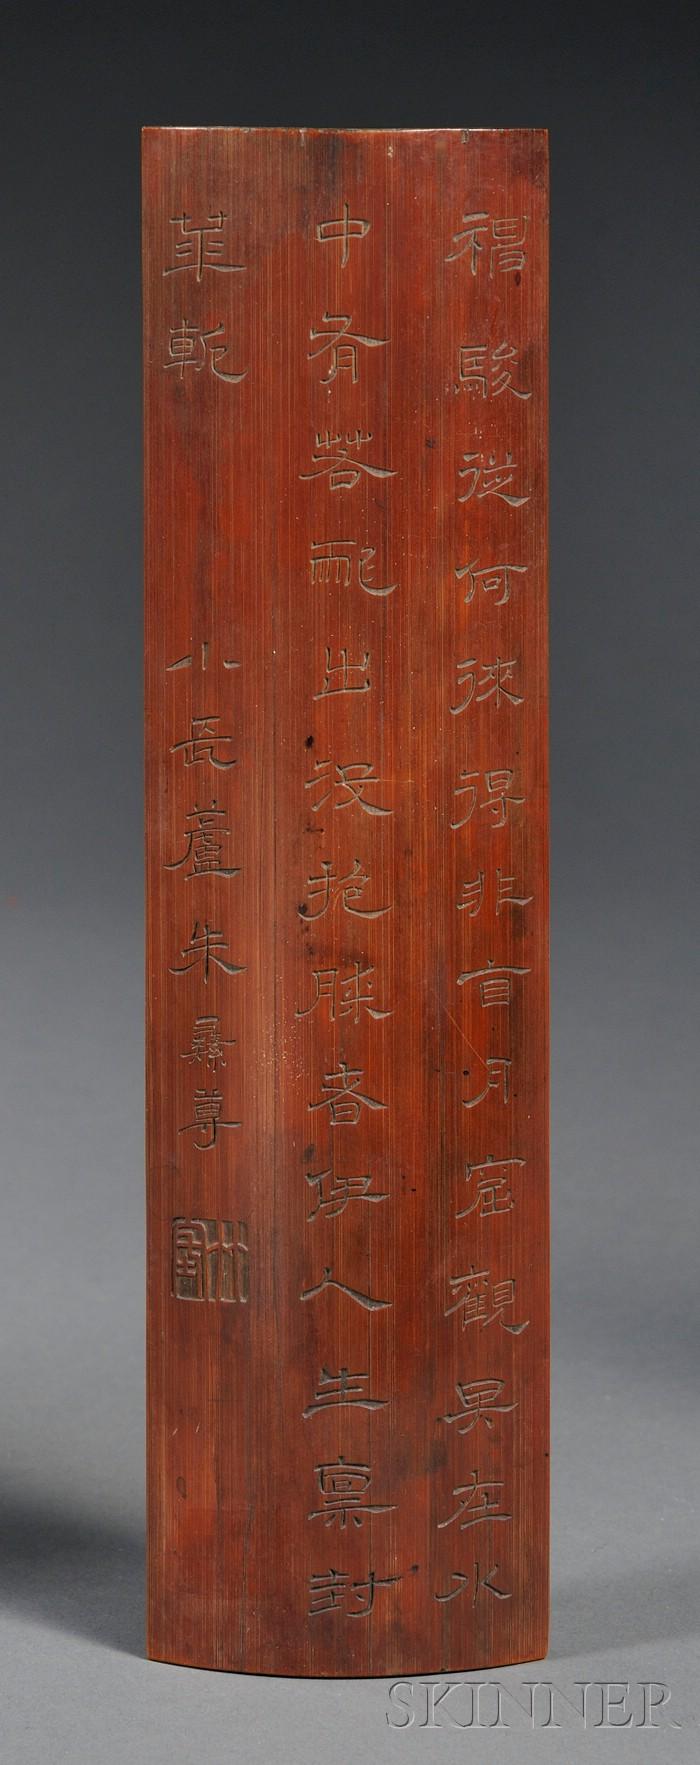 Bamboo Wrist Rest